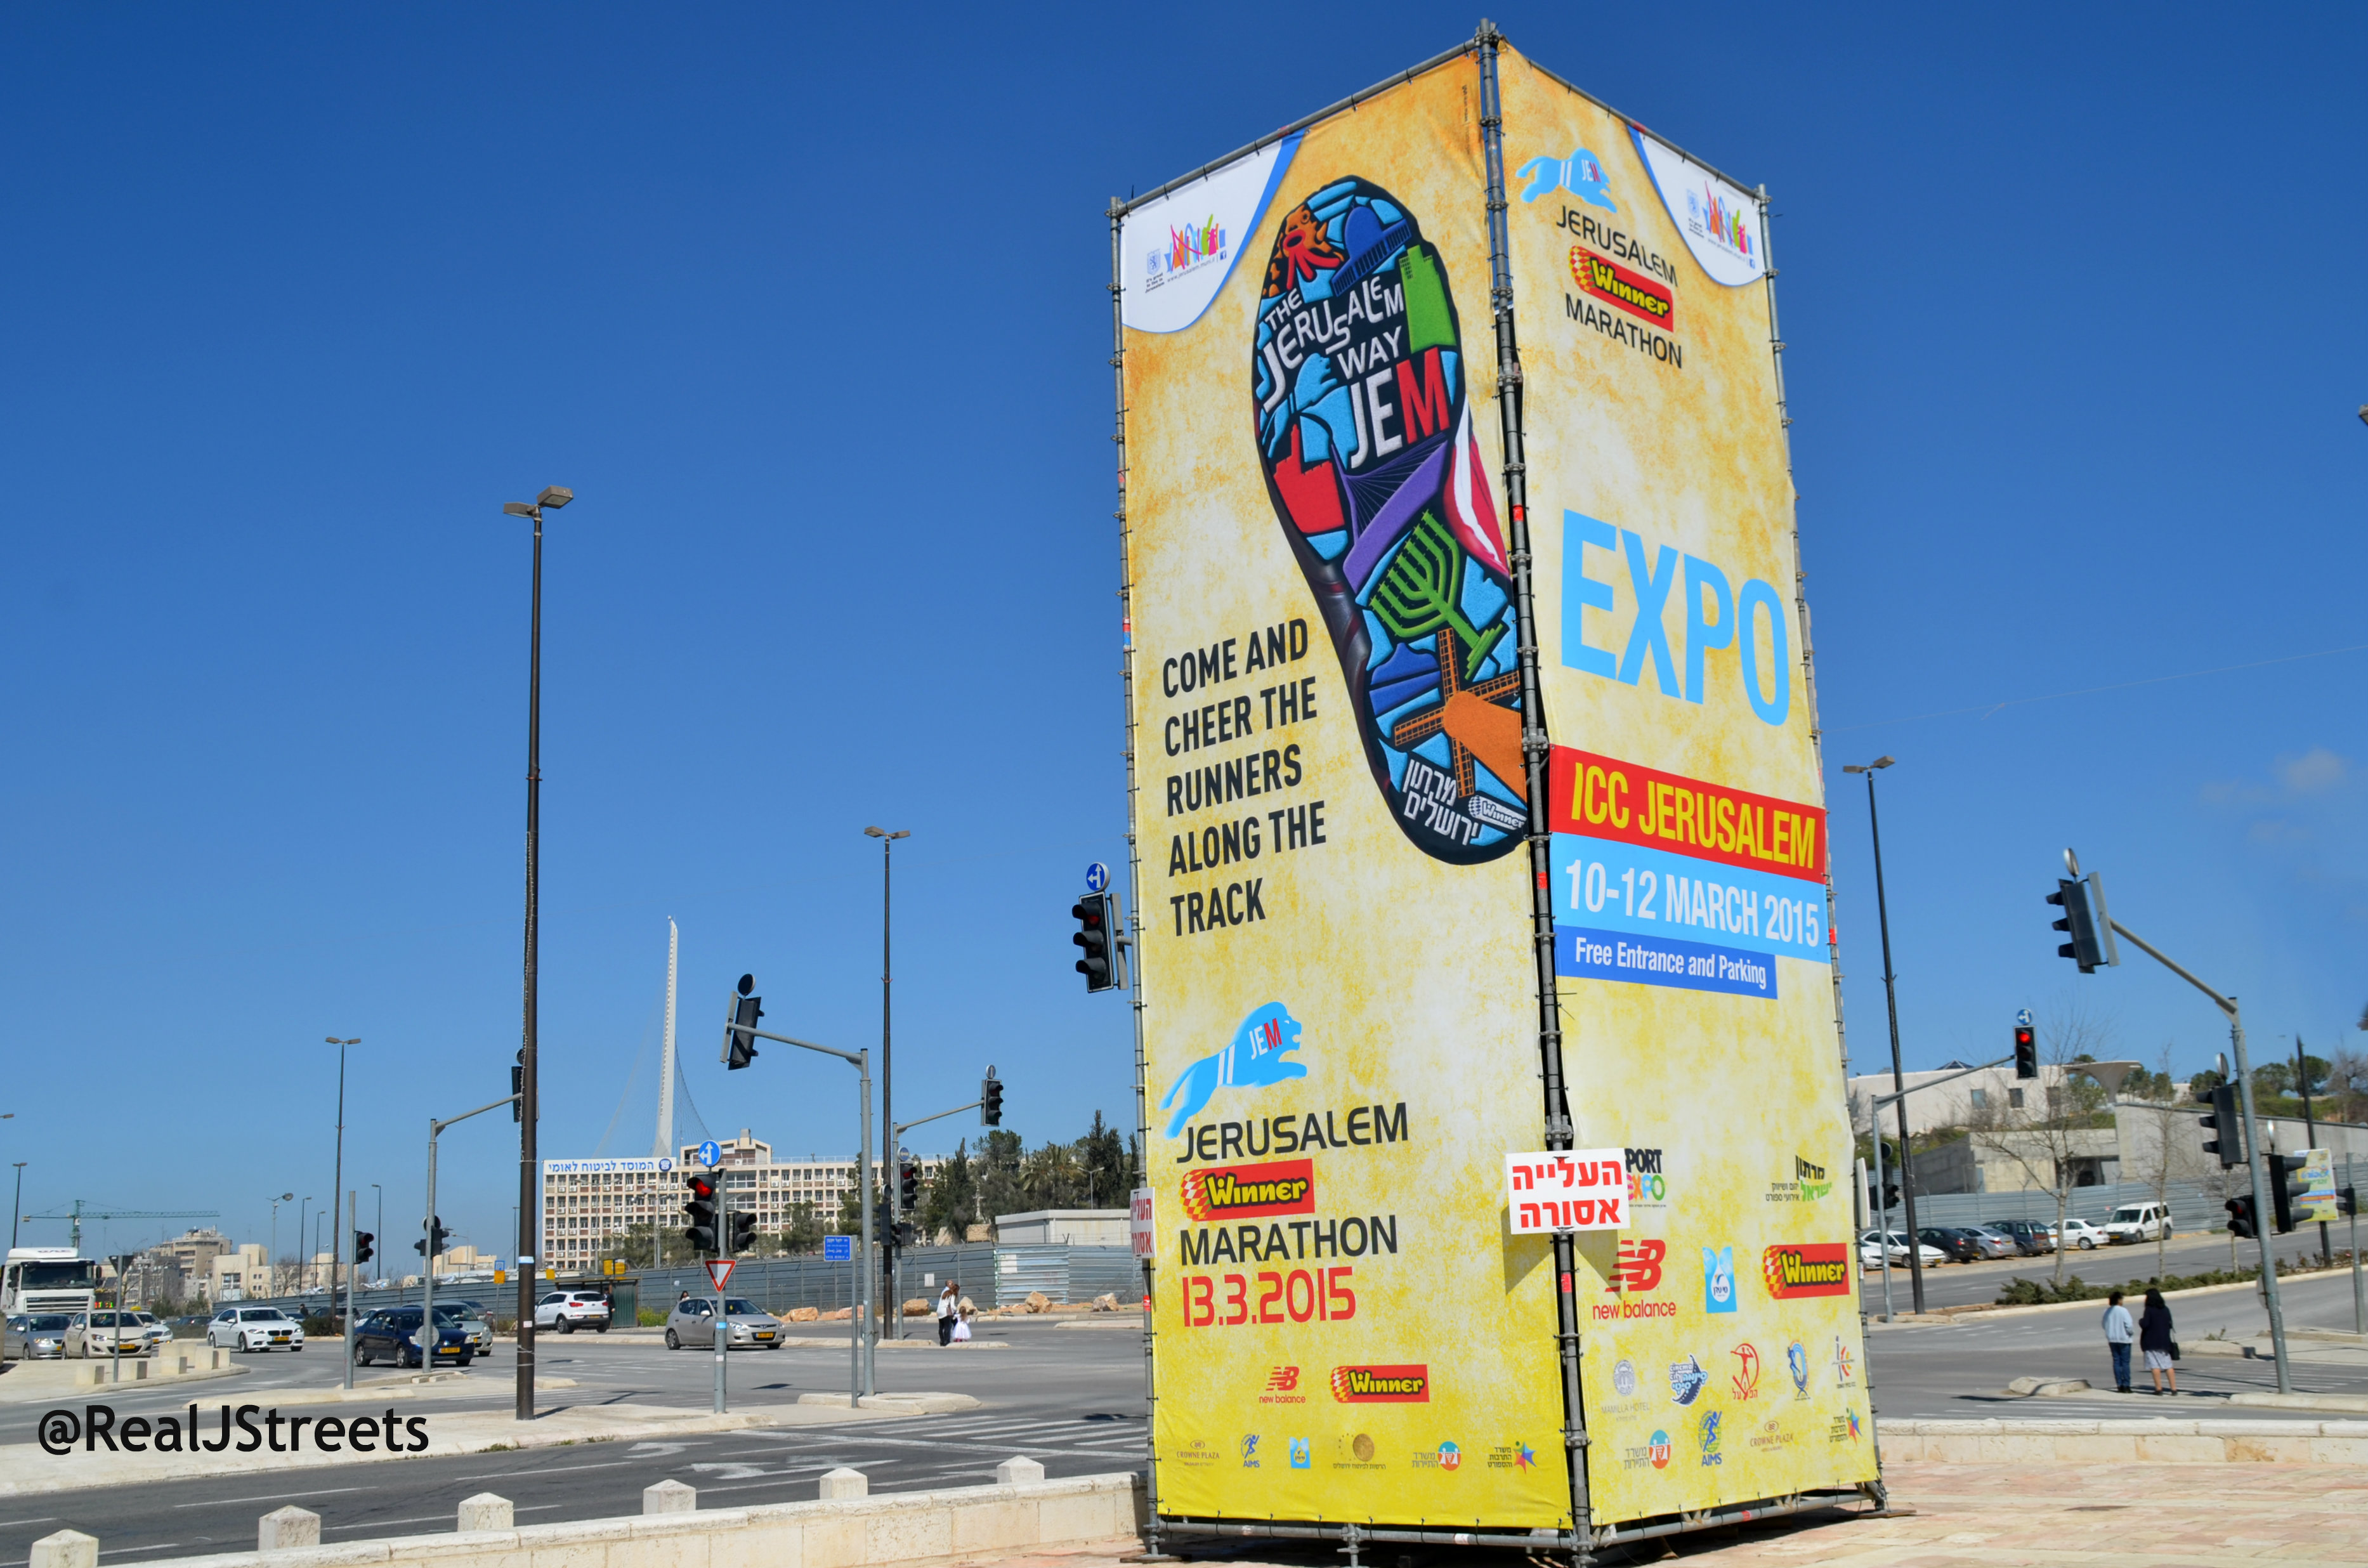 ad for Jerusalem marathon